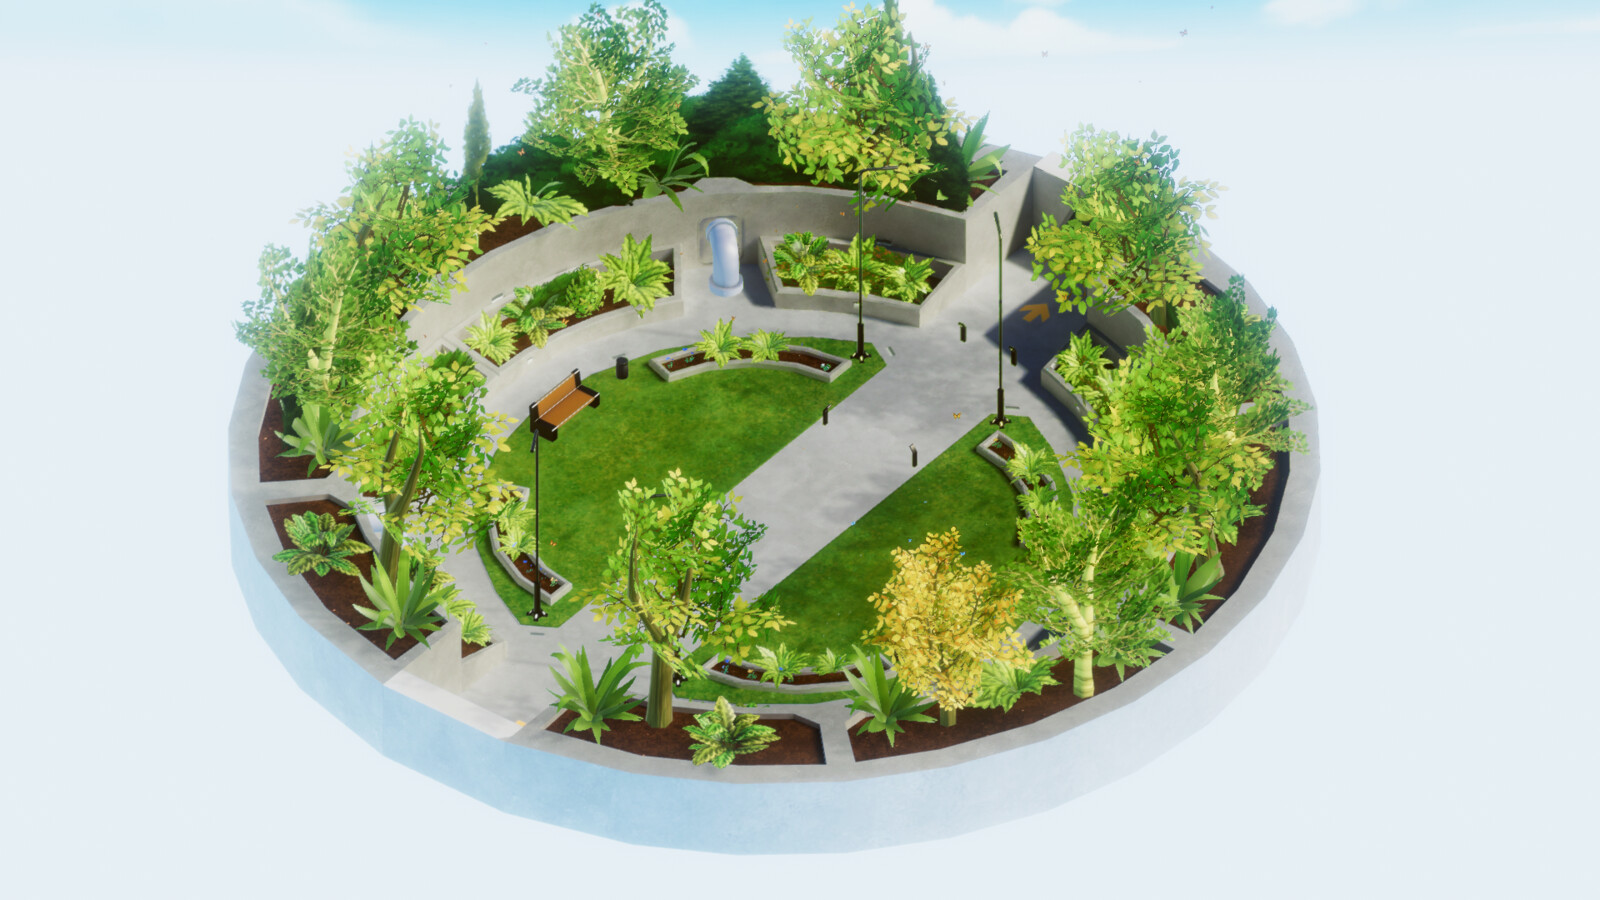 VR mobile stylized enviro dome park isometric